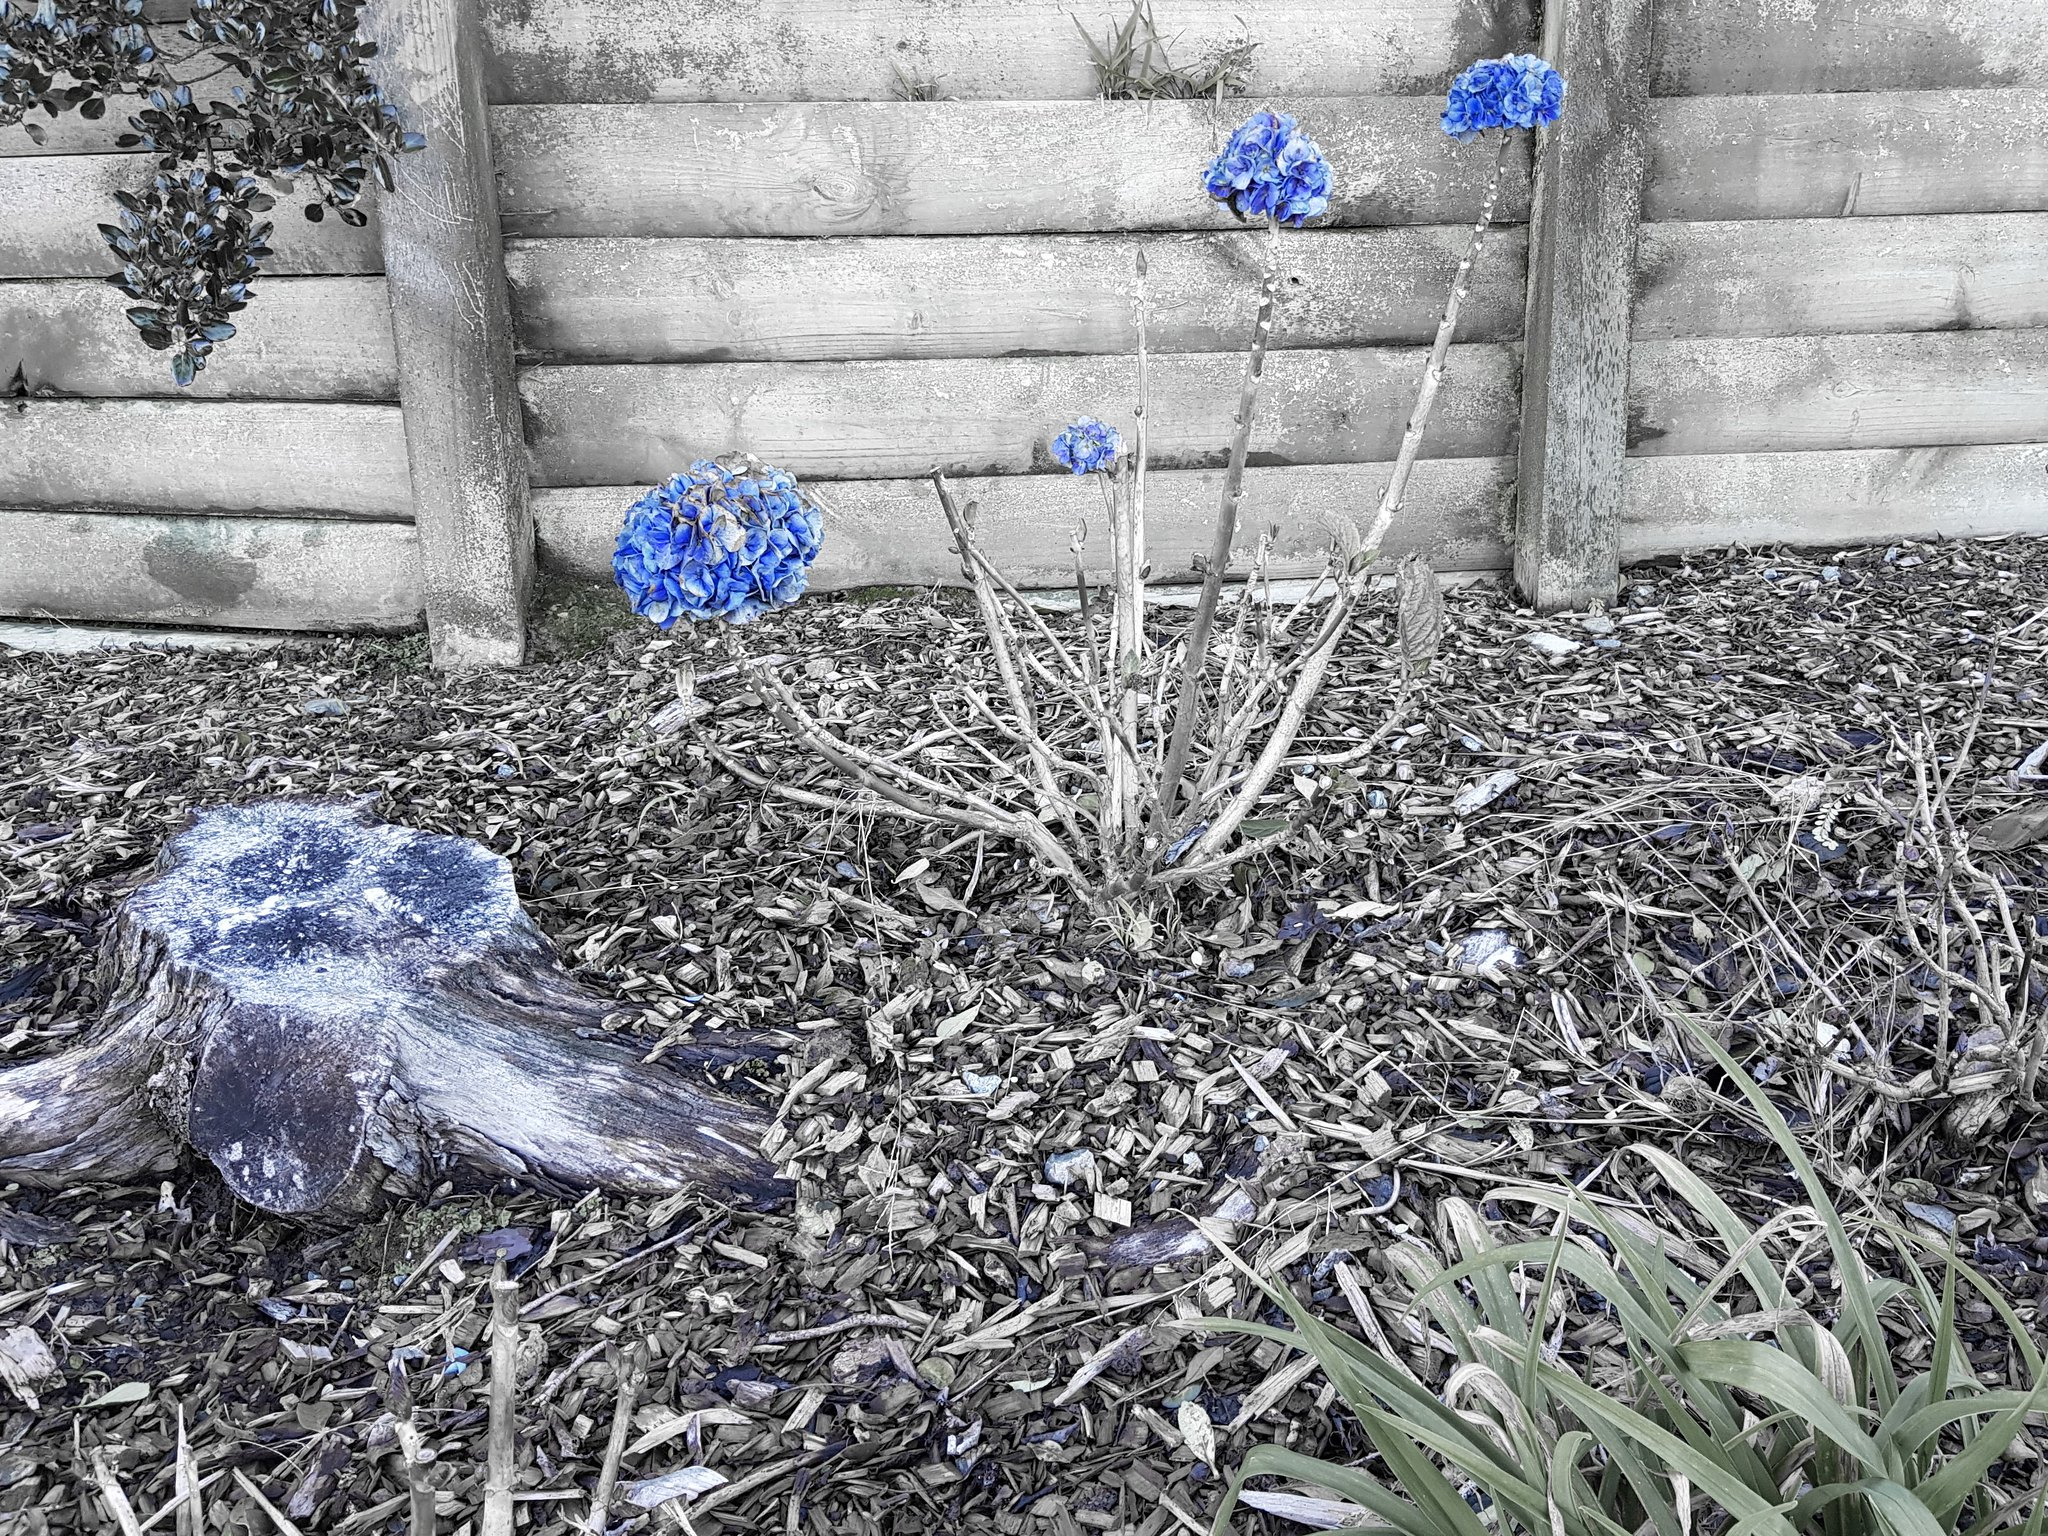 20180710_153555 EDIT (Bolder than blue)